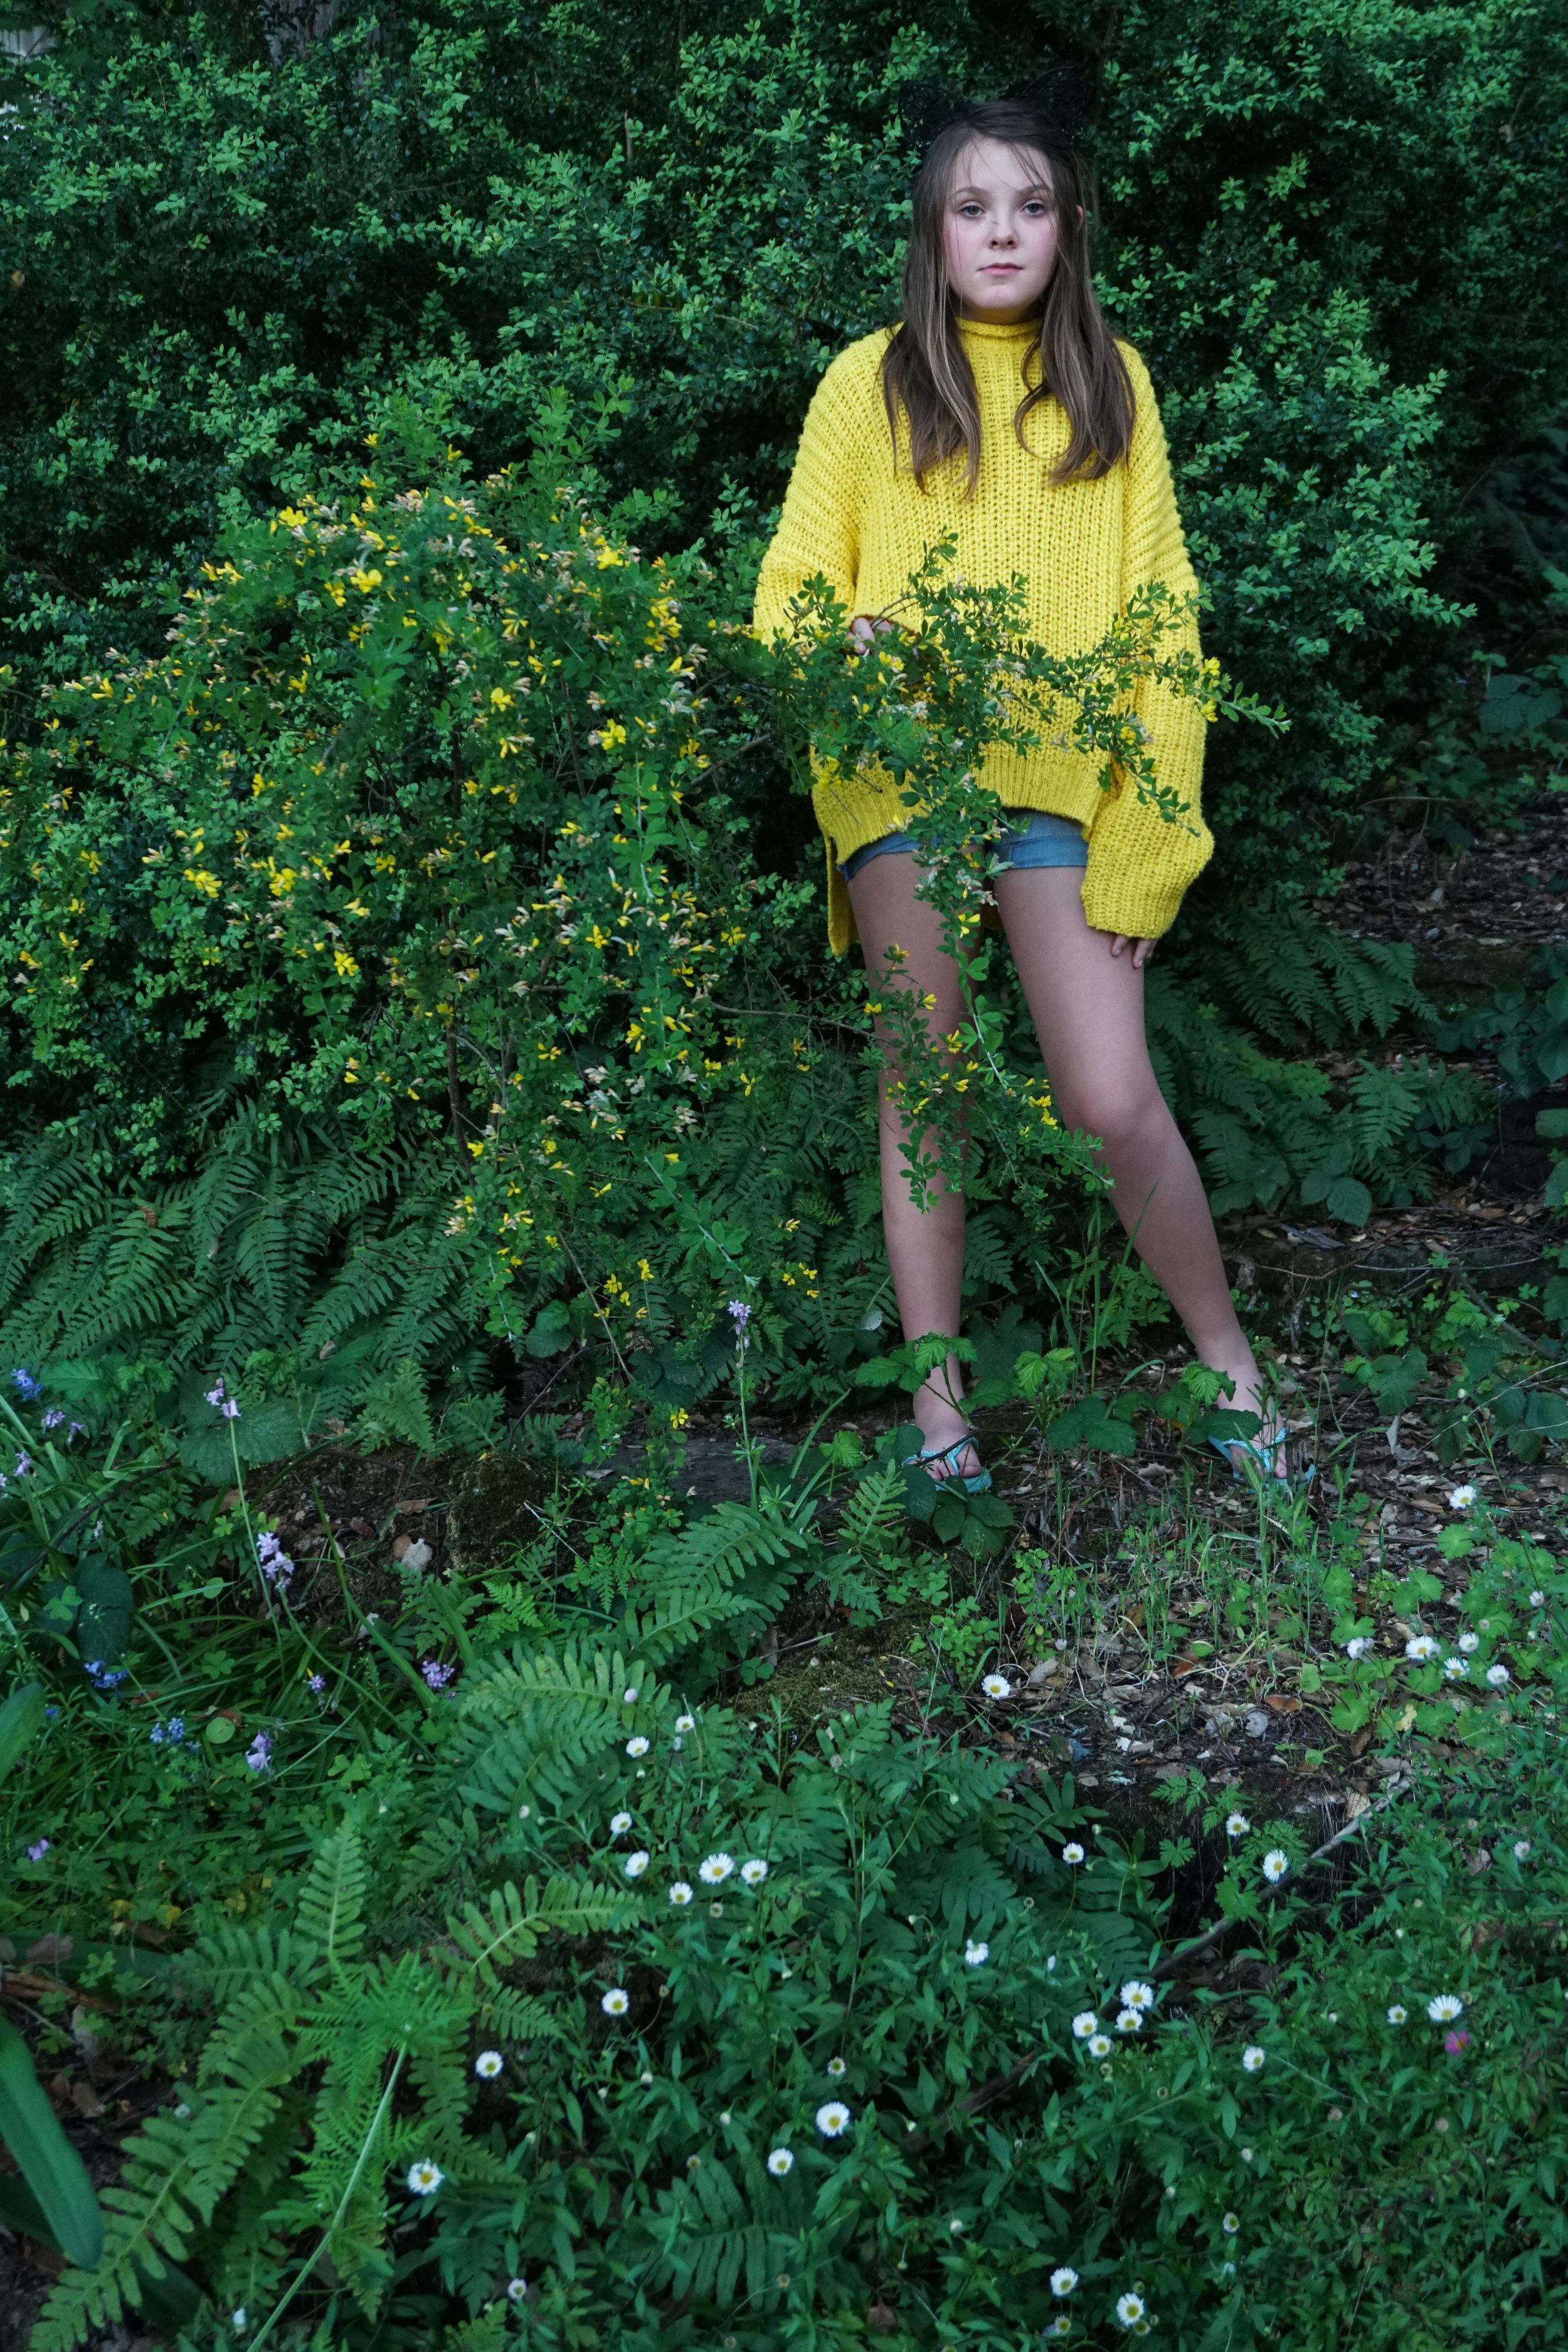 Polly-yellow-8-03799.jpg